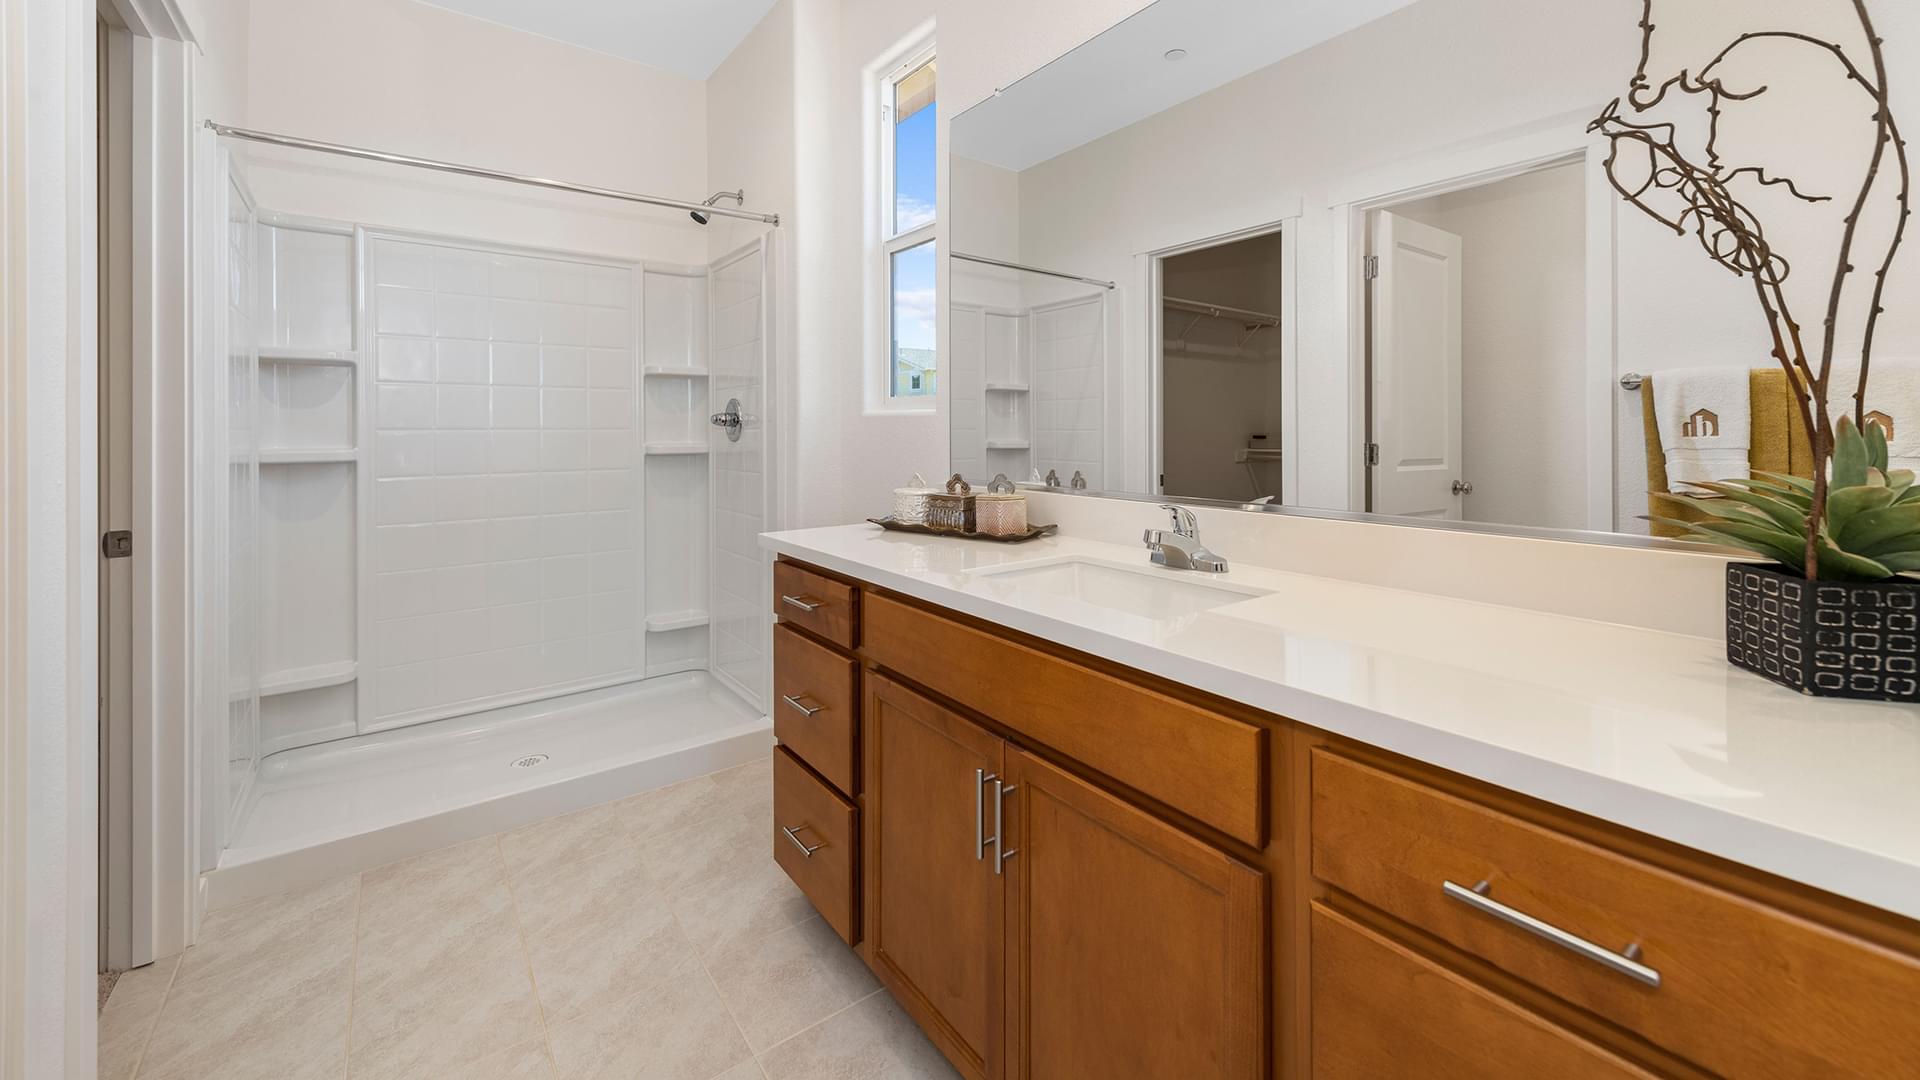 Residence 1 | Lot 166 | Master Bath